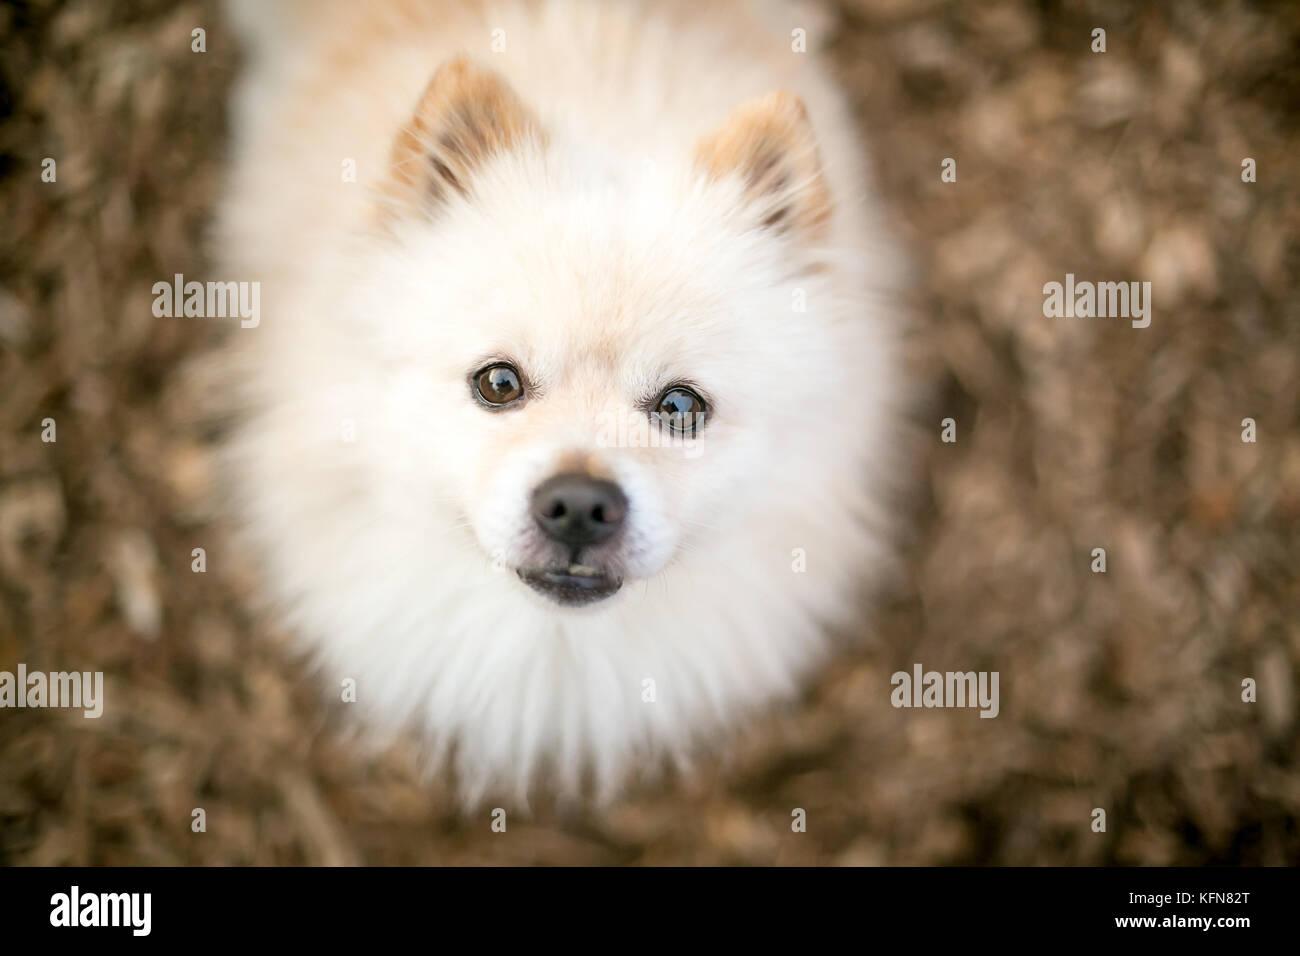 A Cream Colored Purebred Pomeranian Dog Stock Photo 164580496 Alamy